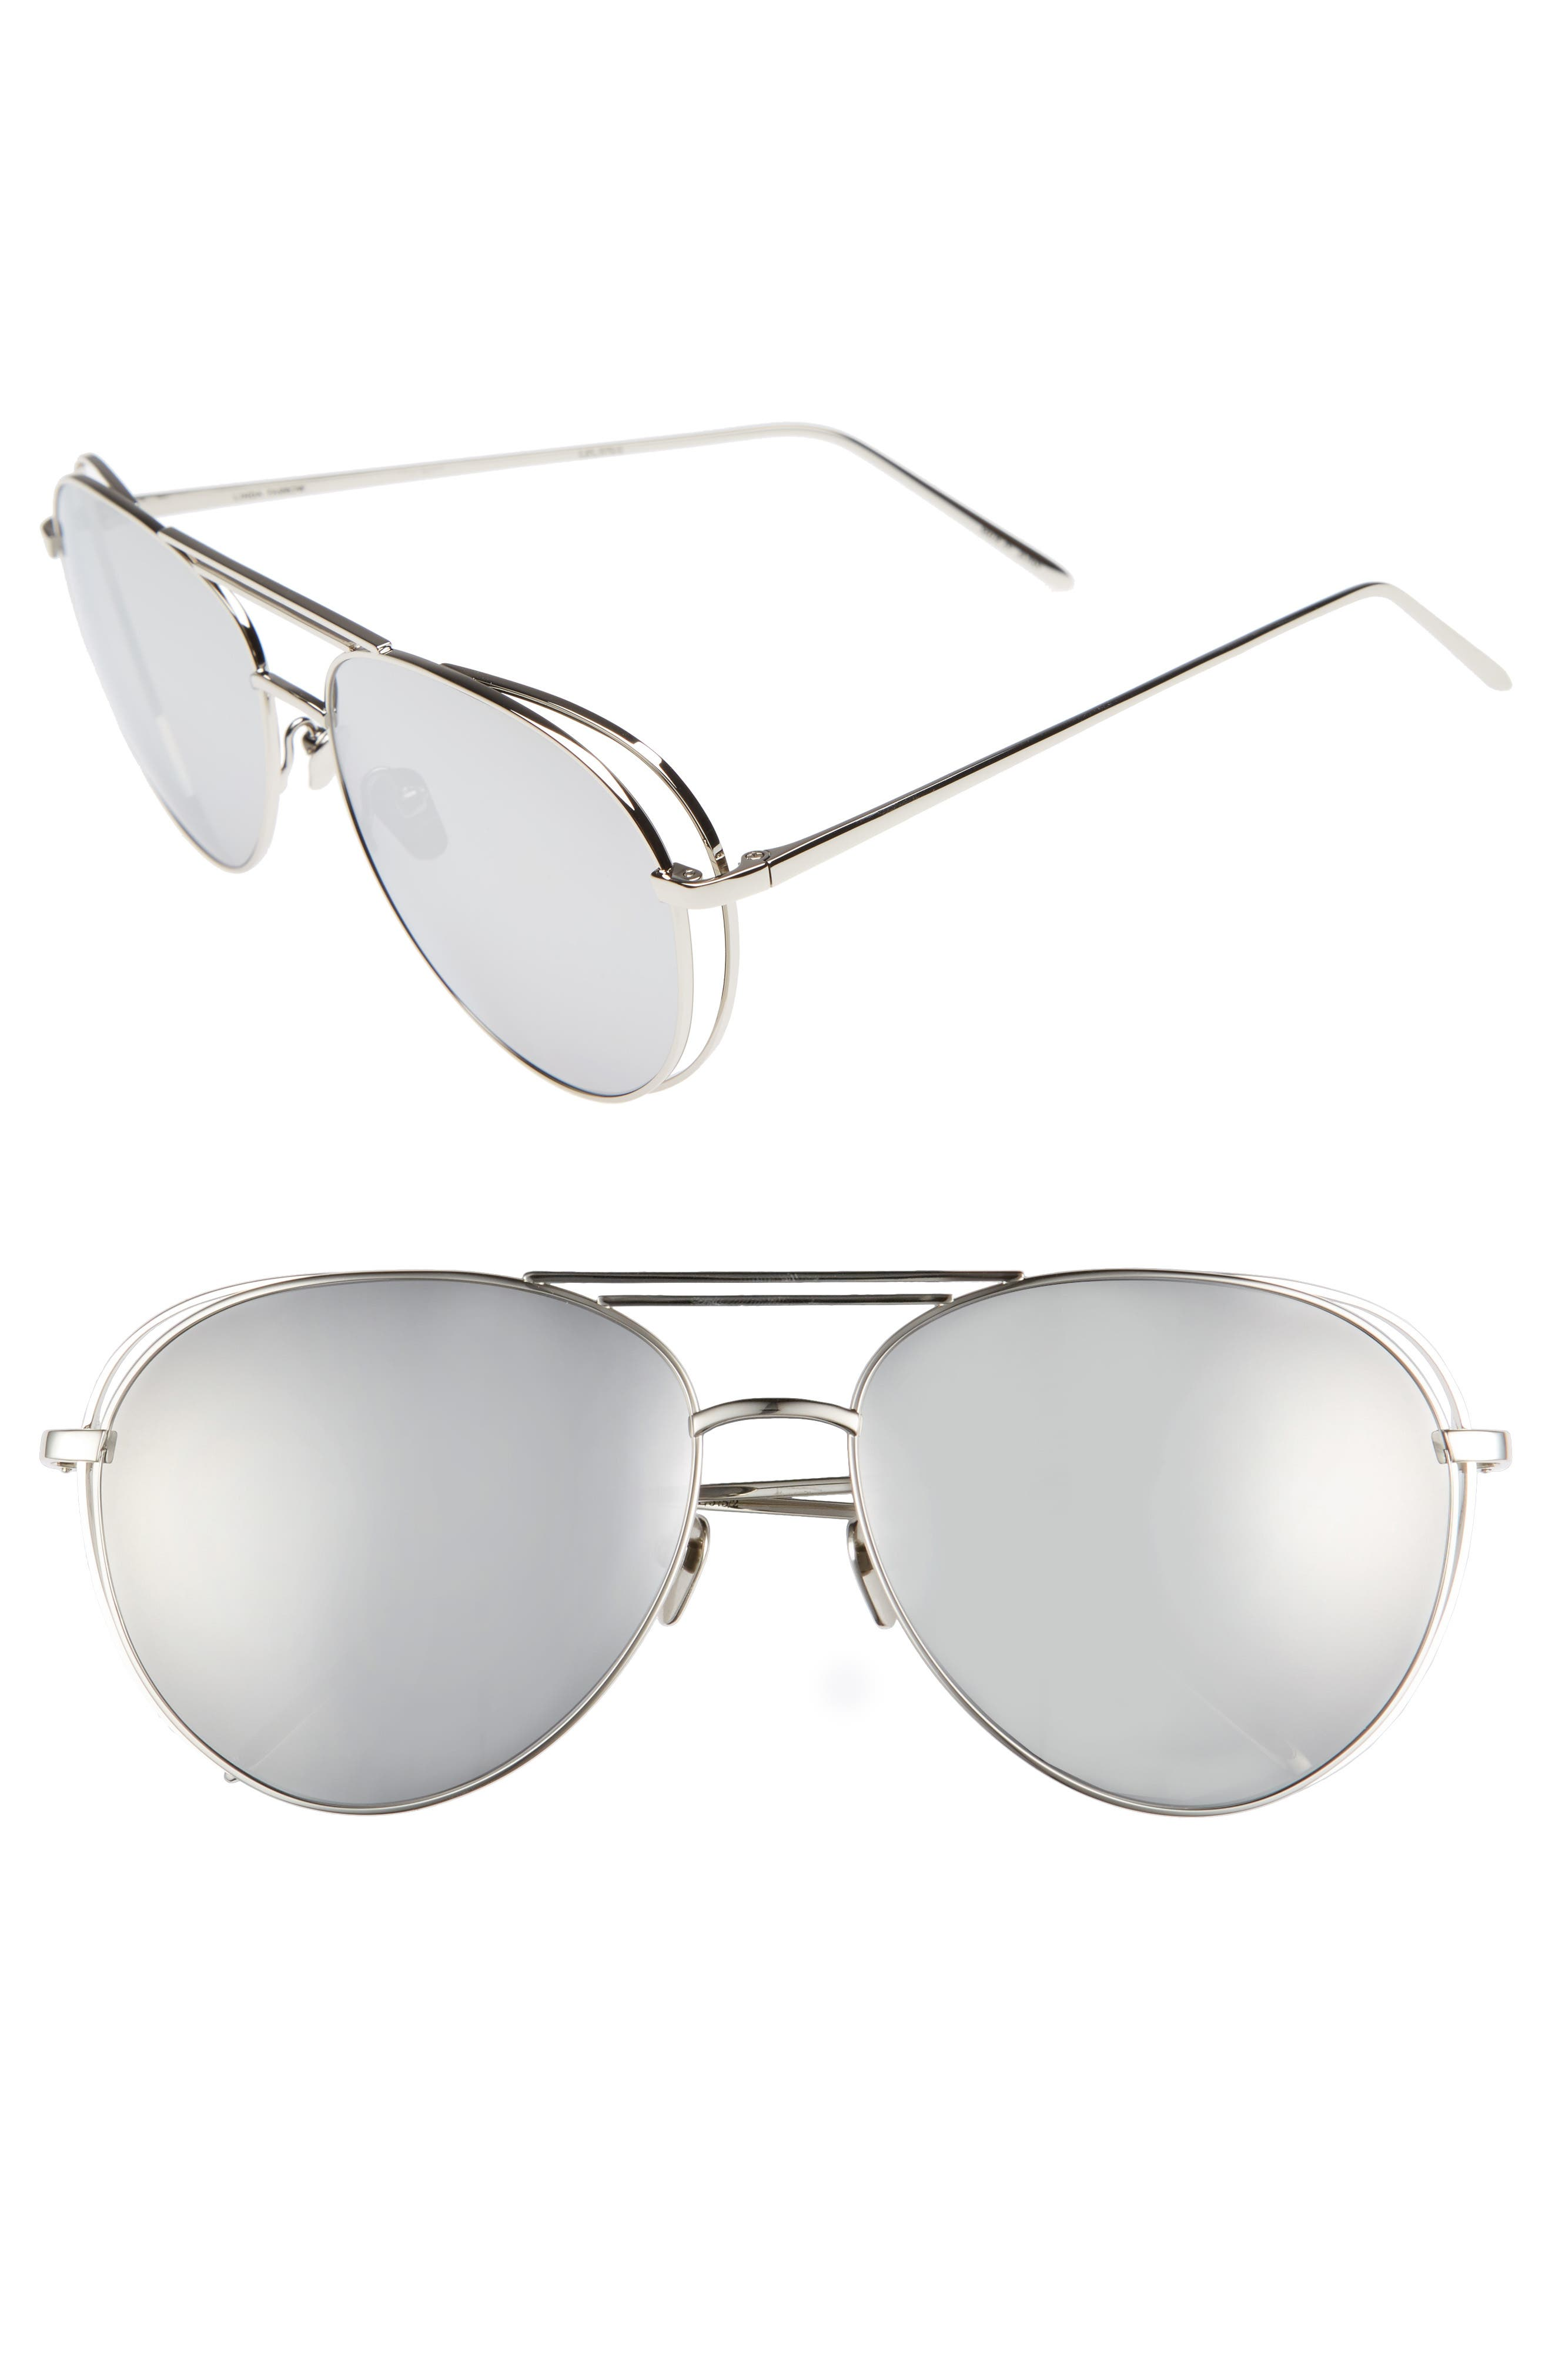 Linda Farrow 60mm Mirrored 18 Karat White Gold Sunglasses